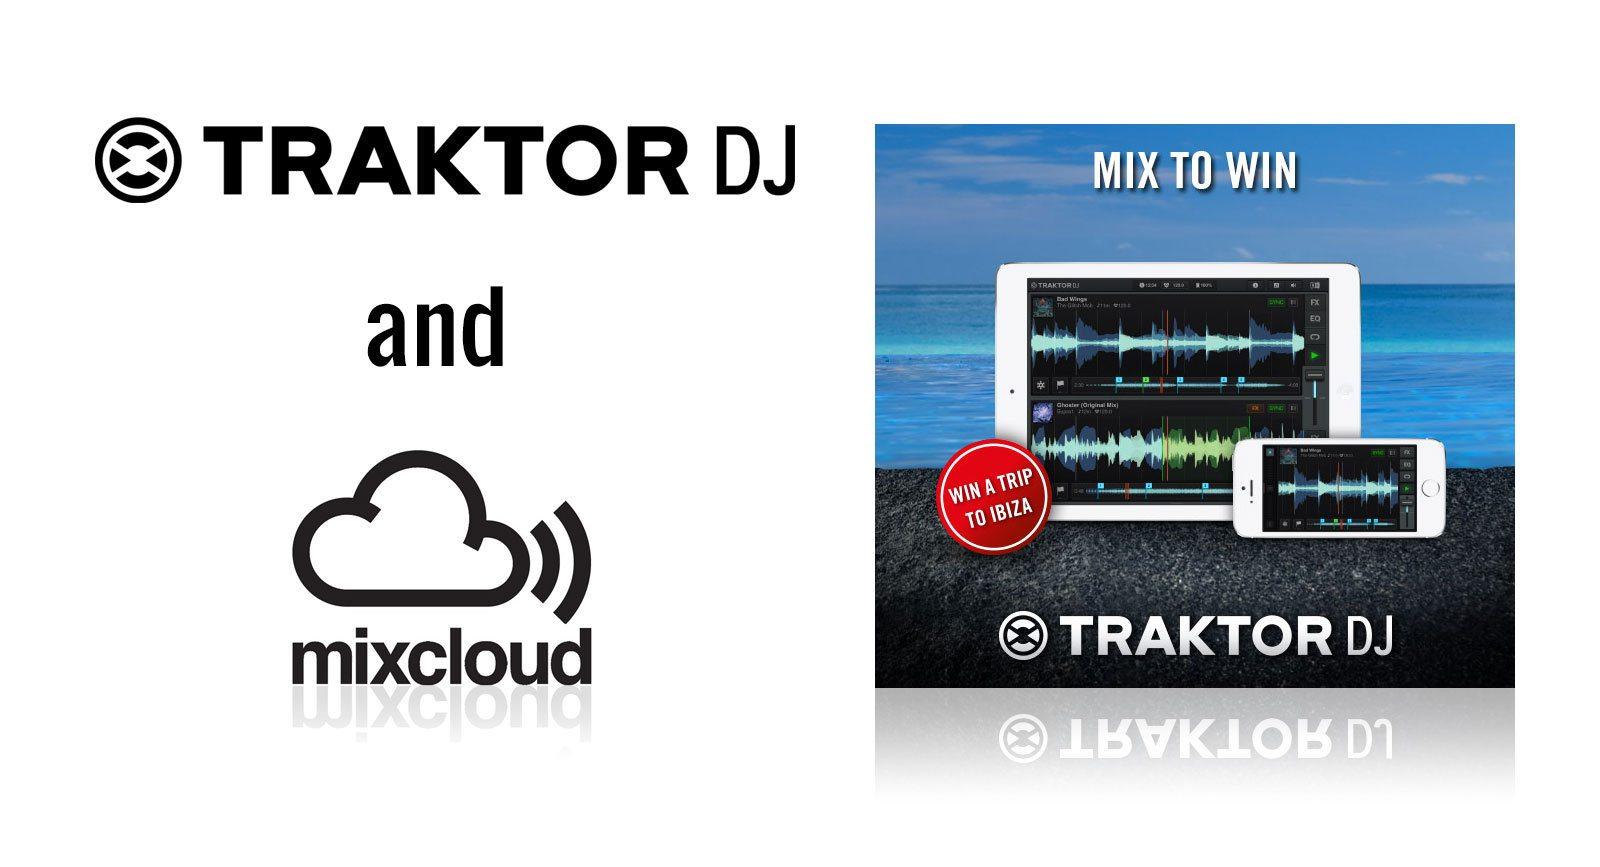 Traktor DJ 1 4 drops with Mixcloud integration and effects